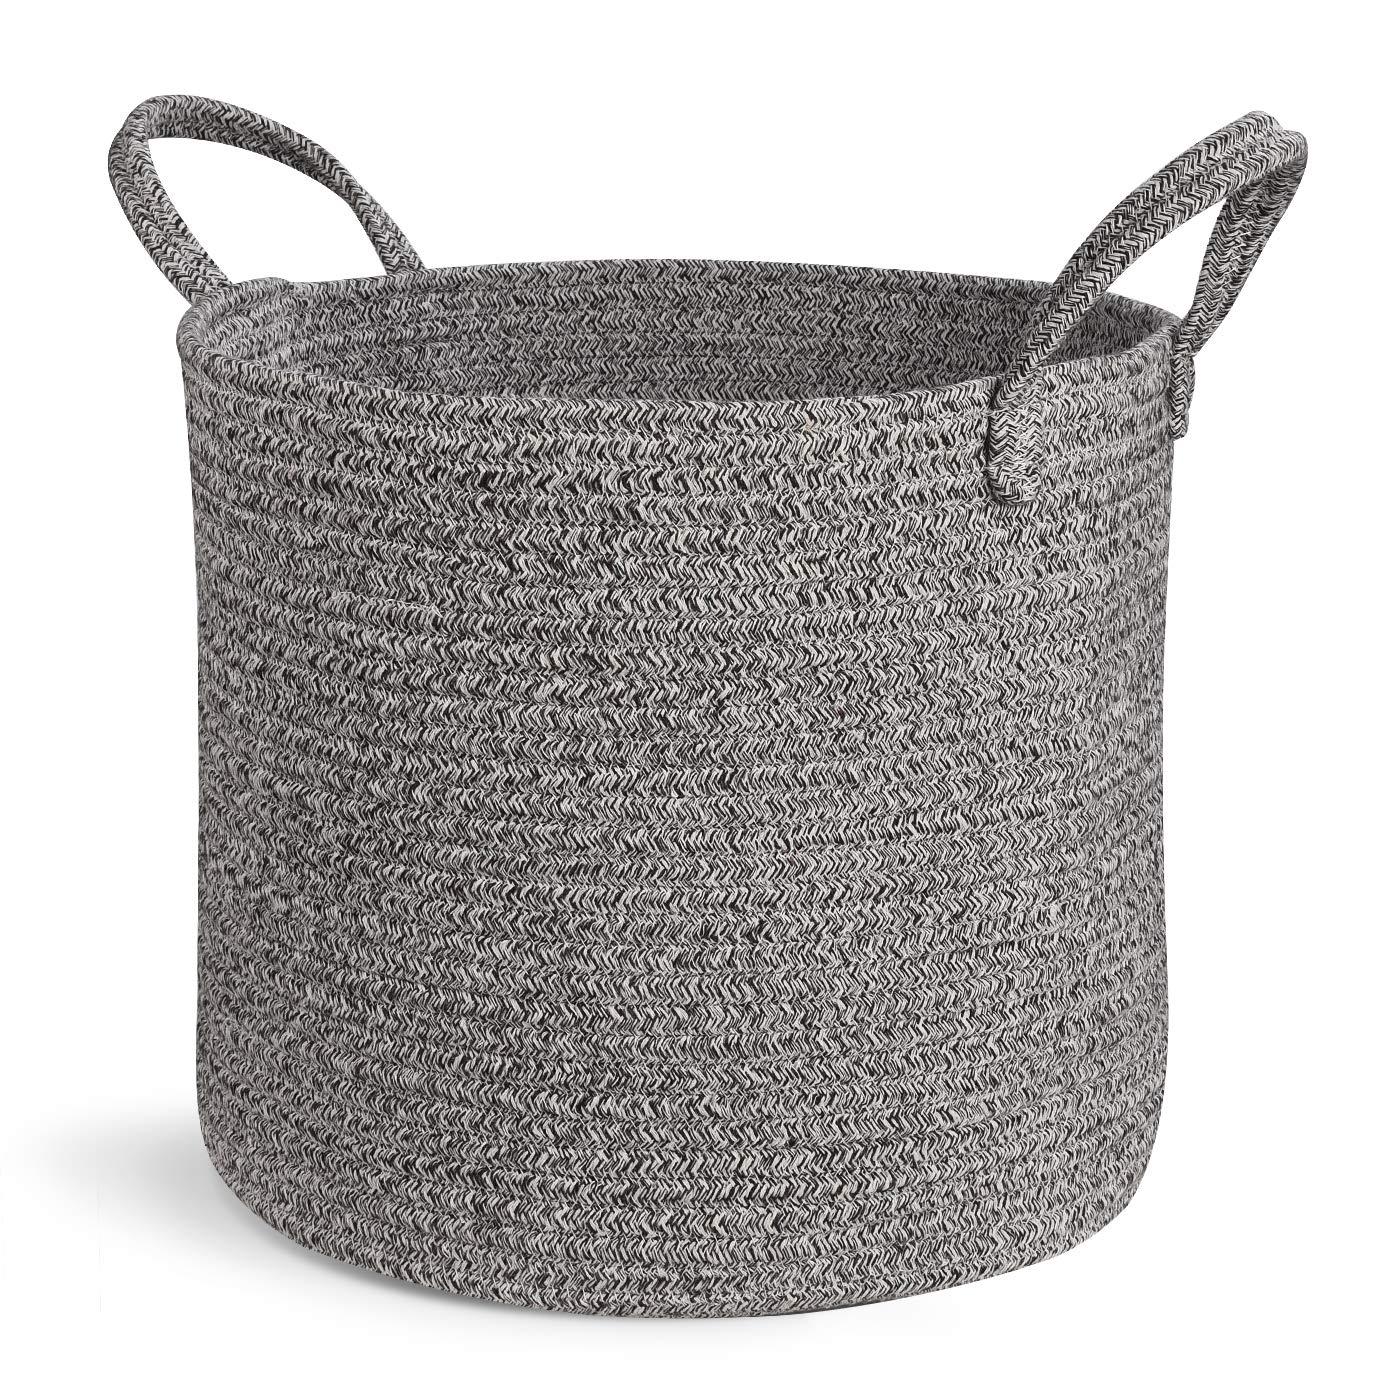 Large Woven Blanket Storage Basket, Grey Laundry Baskets 15 x13 by CiKi Home